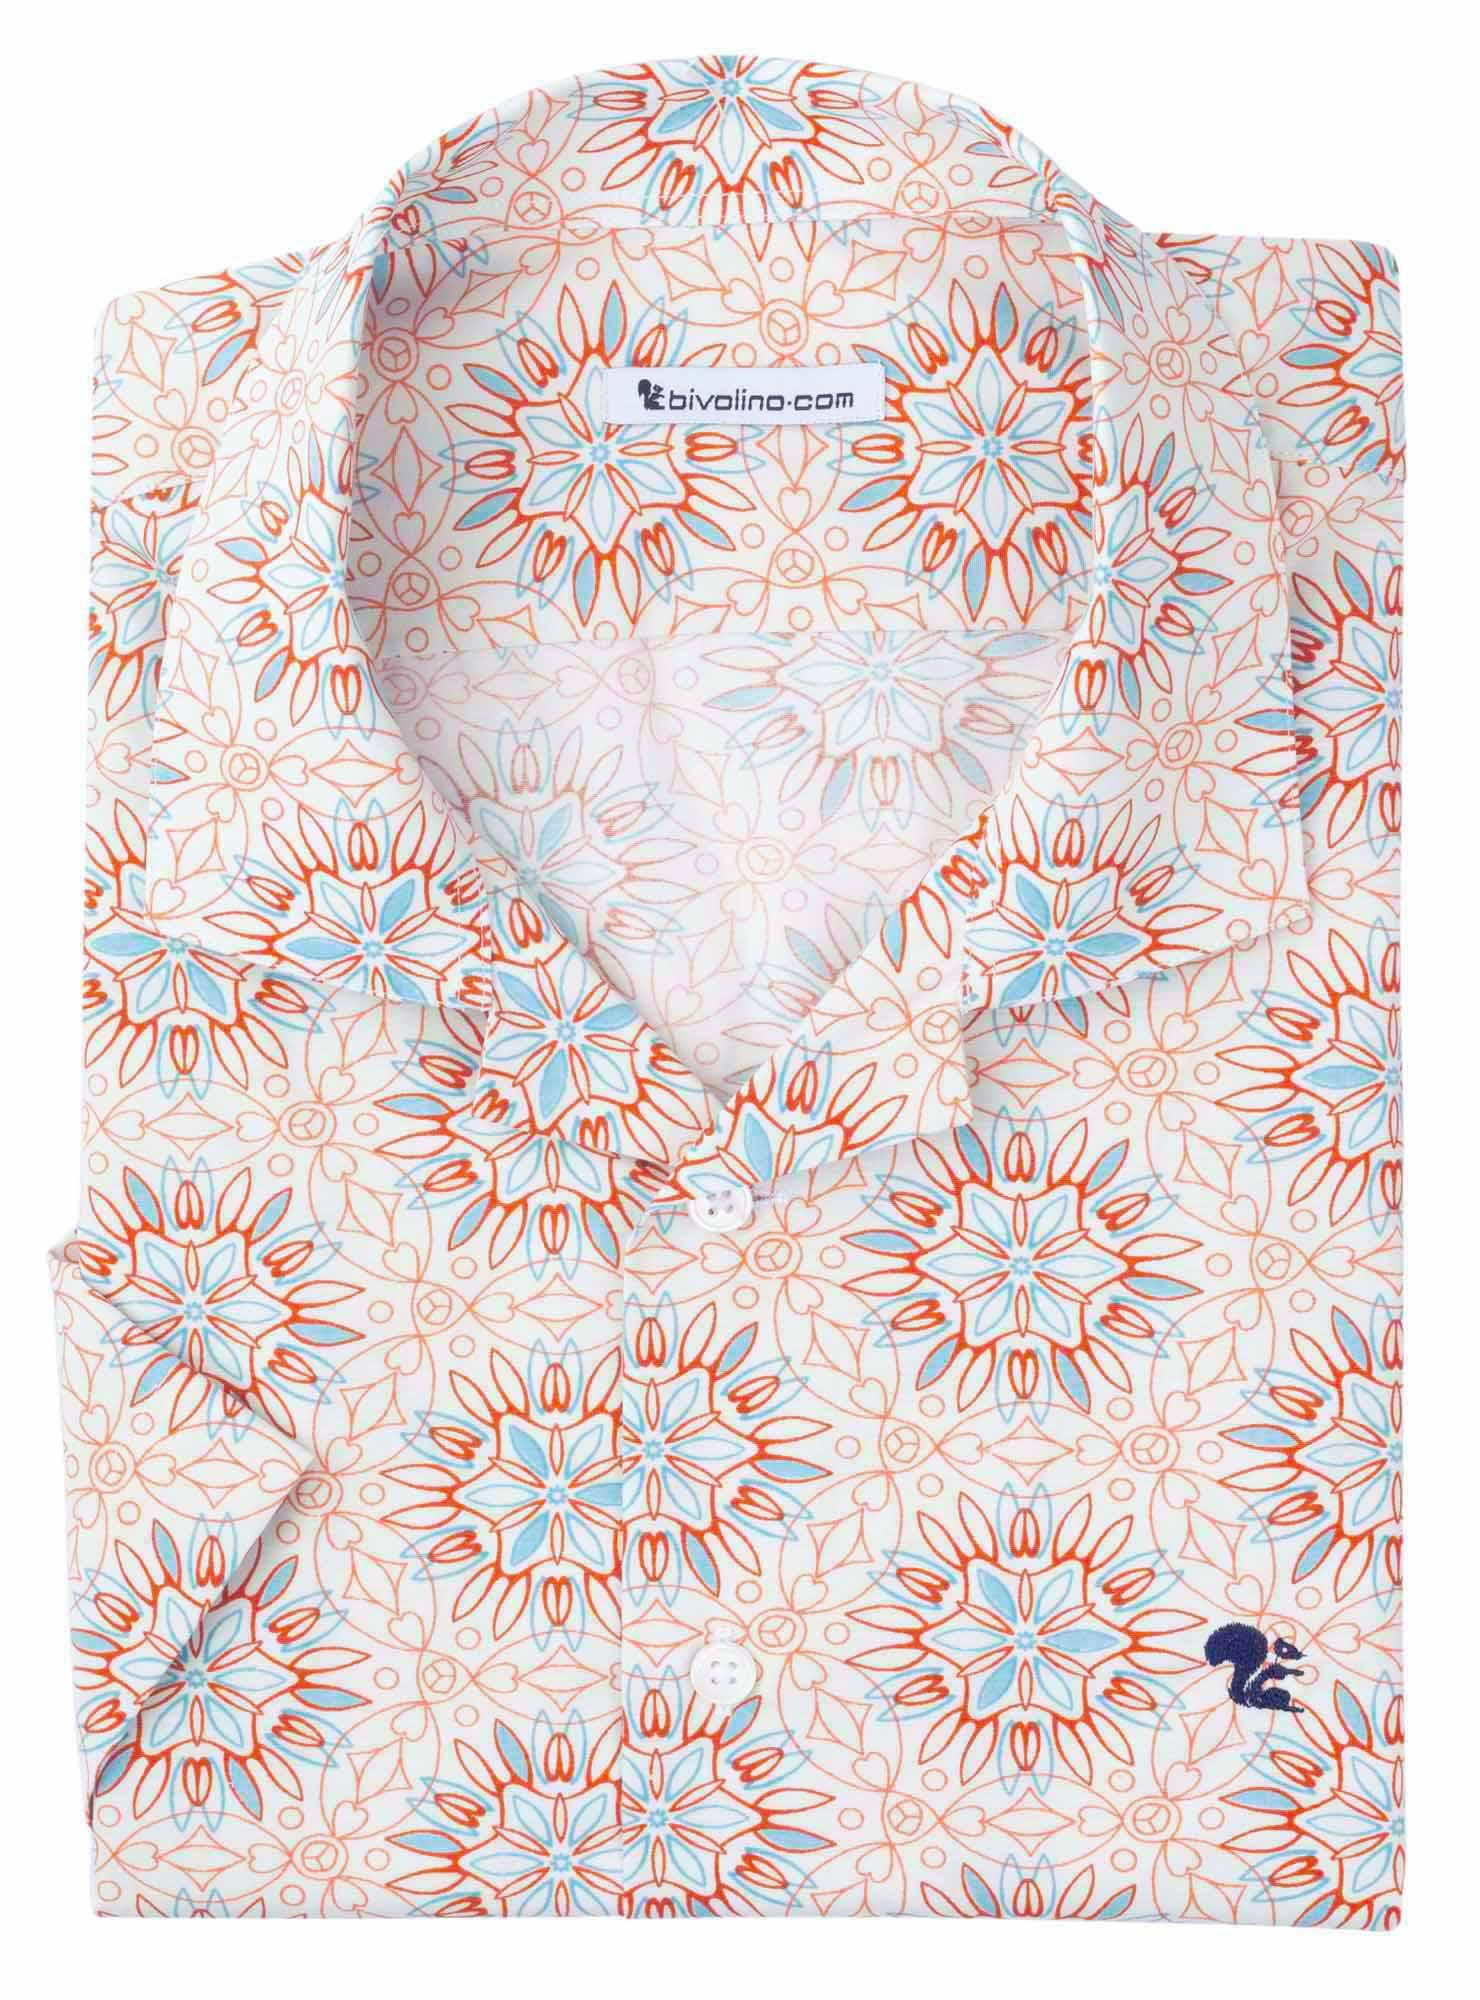 HAWINI - cotton hawaiian shirt - Manio 1